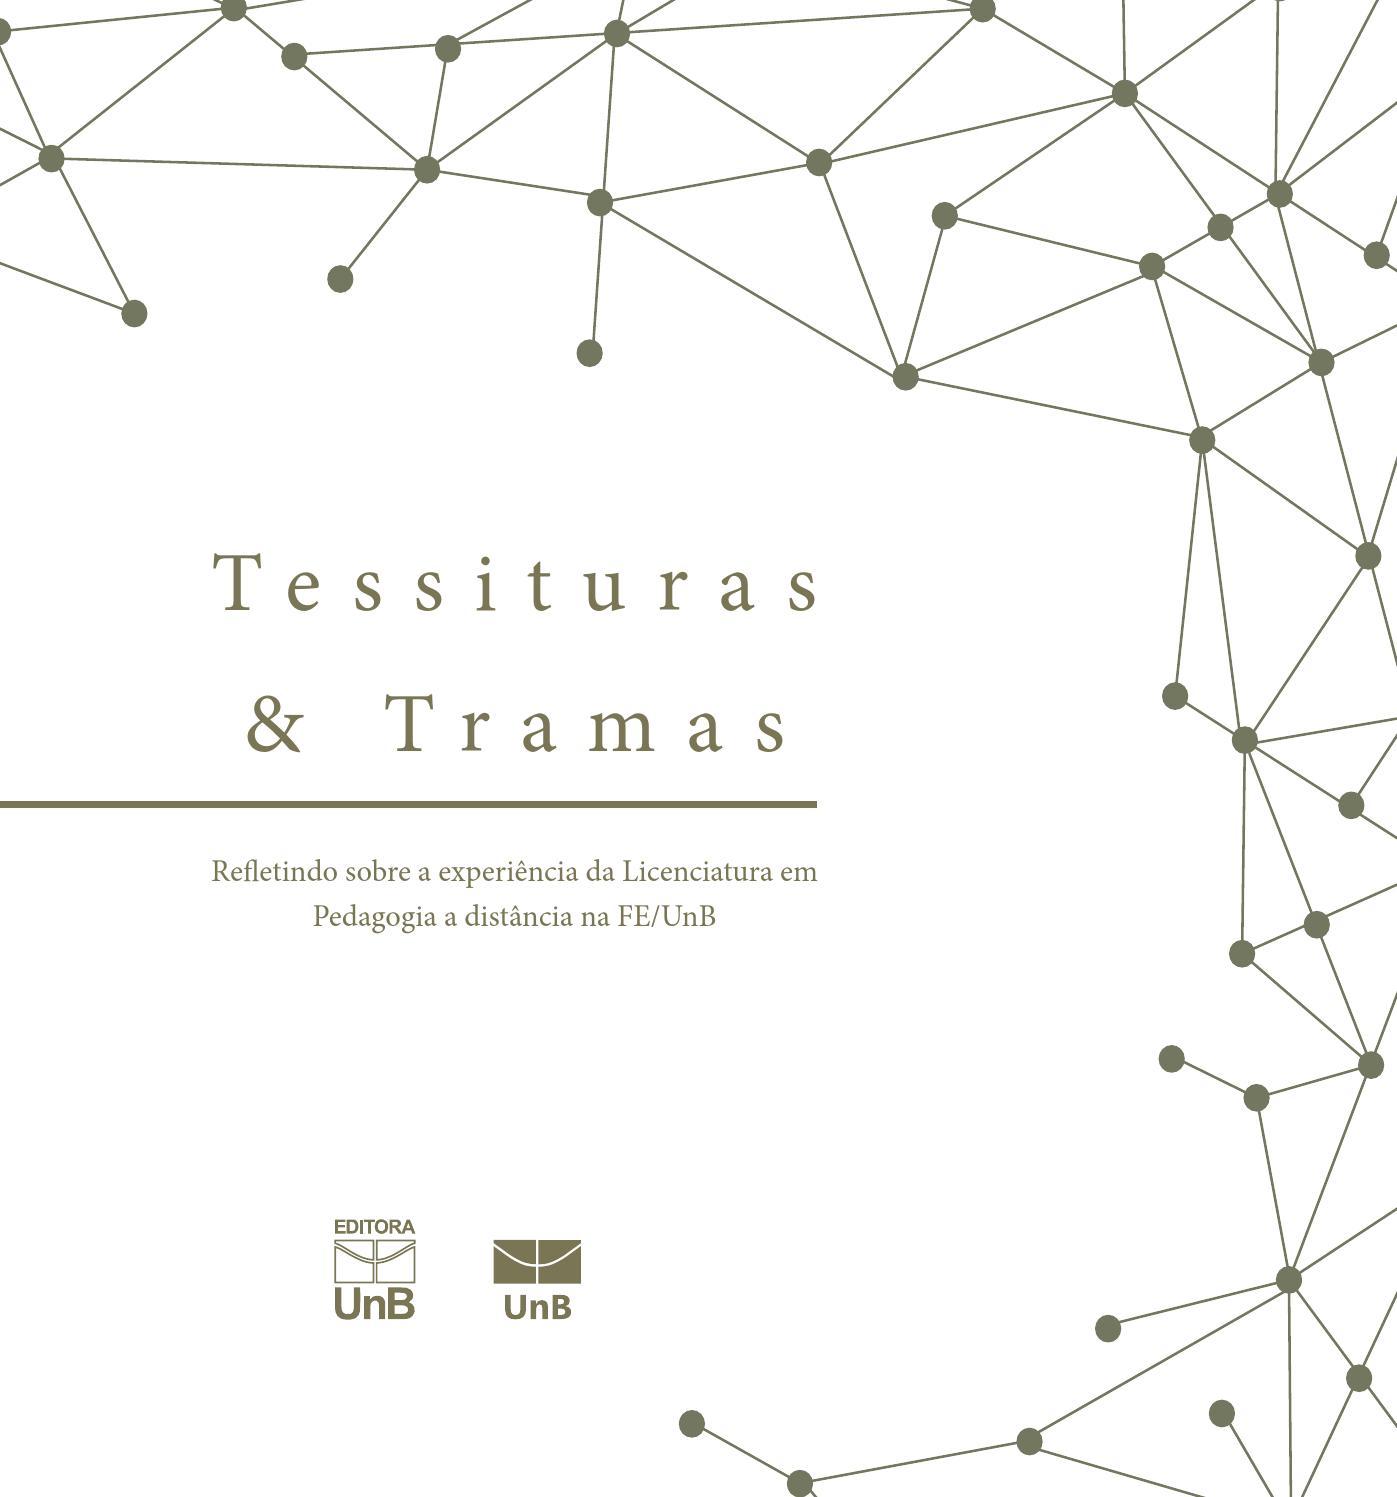 Tessituras e tramas by Ead Unb - issuu 97e40277233